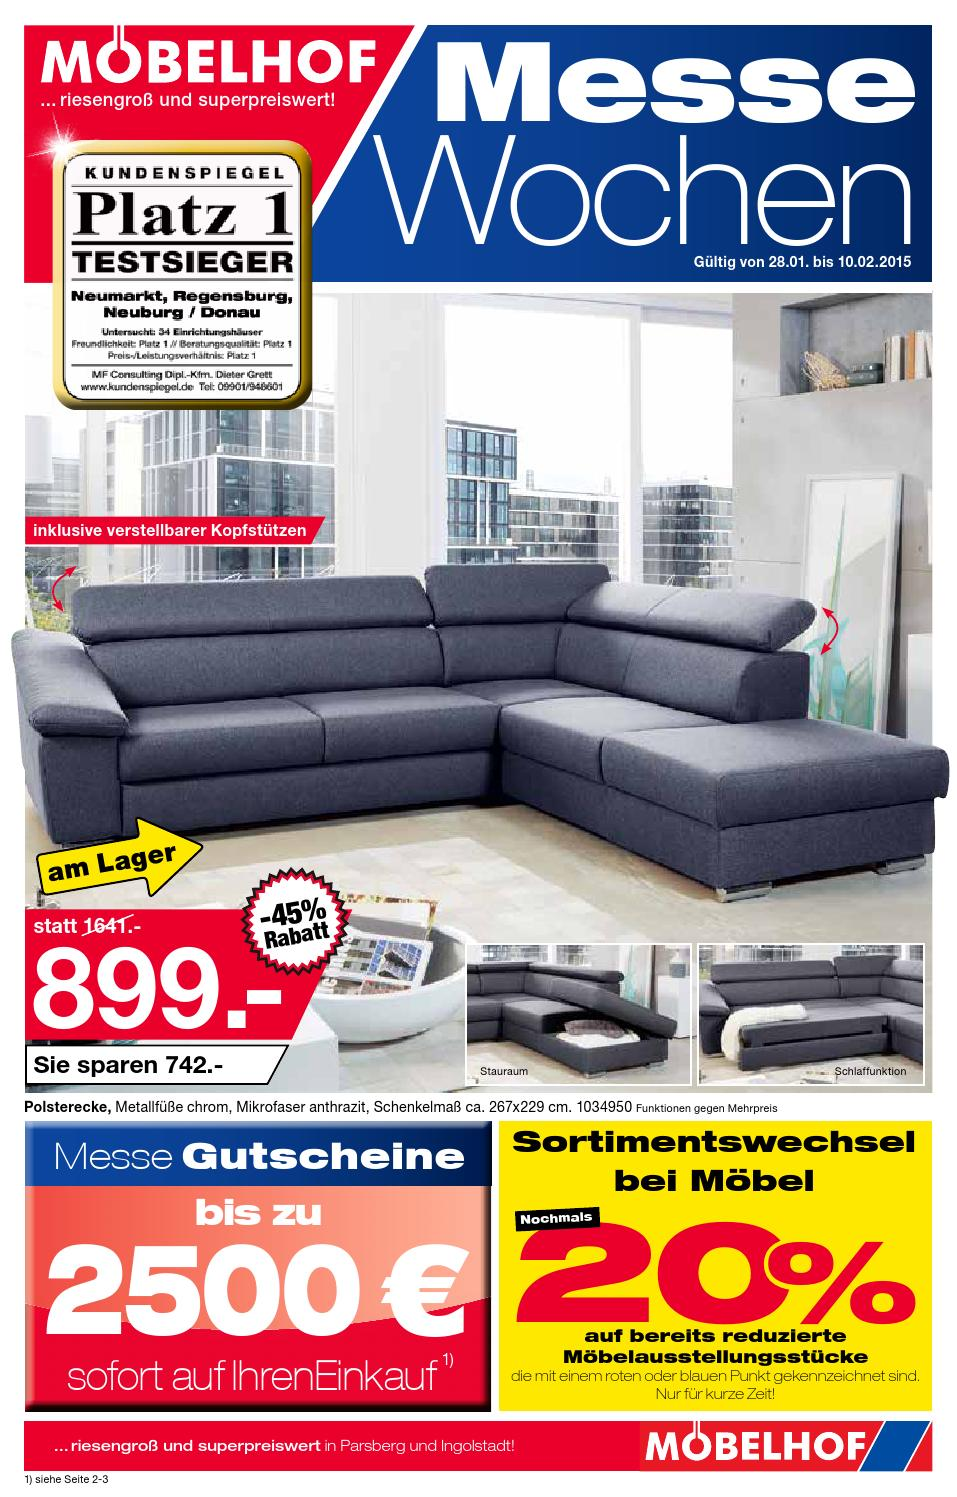 m belhof parsberg g ltig von bis by. Black Bedroom Furniture Sets. Home Design Ideas